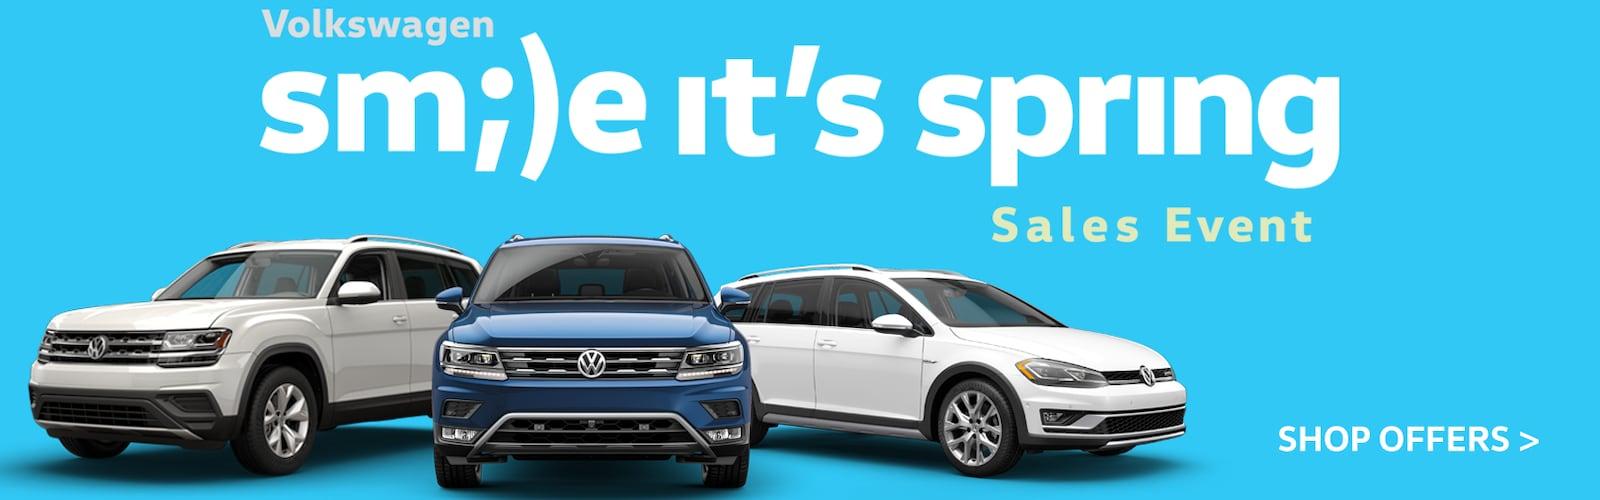 New Vw And Used Car Dealer In Danvers Kelly Volkswagen